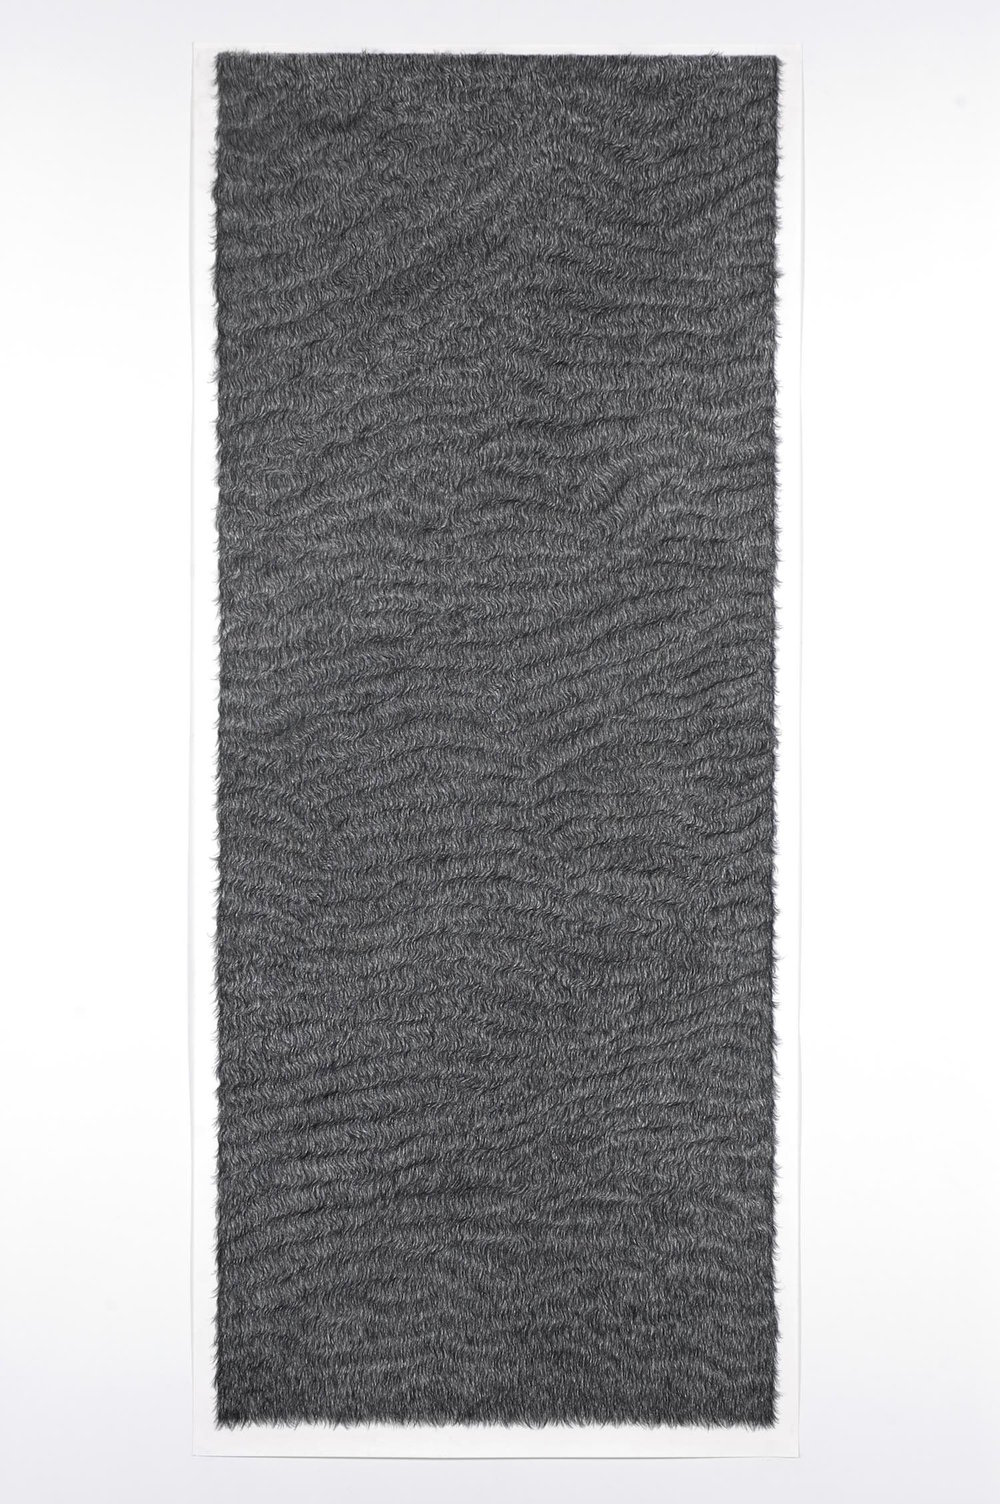 Piel 2   Carboncillo sobre papel 213 x 92 cm. 2004